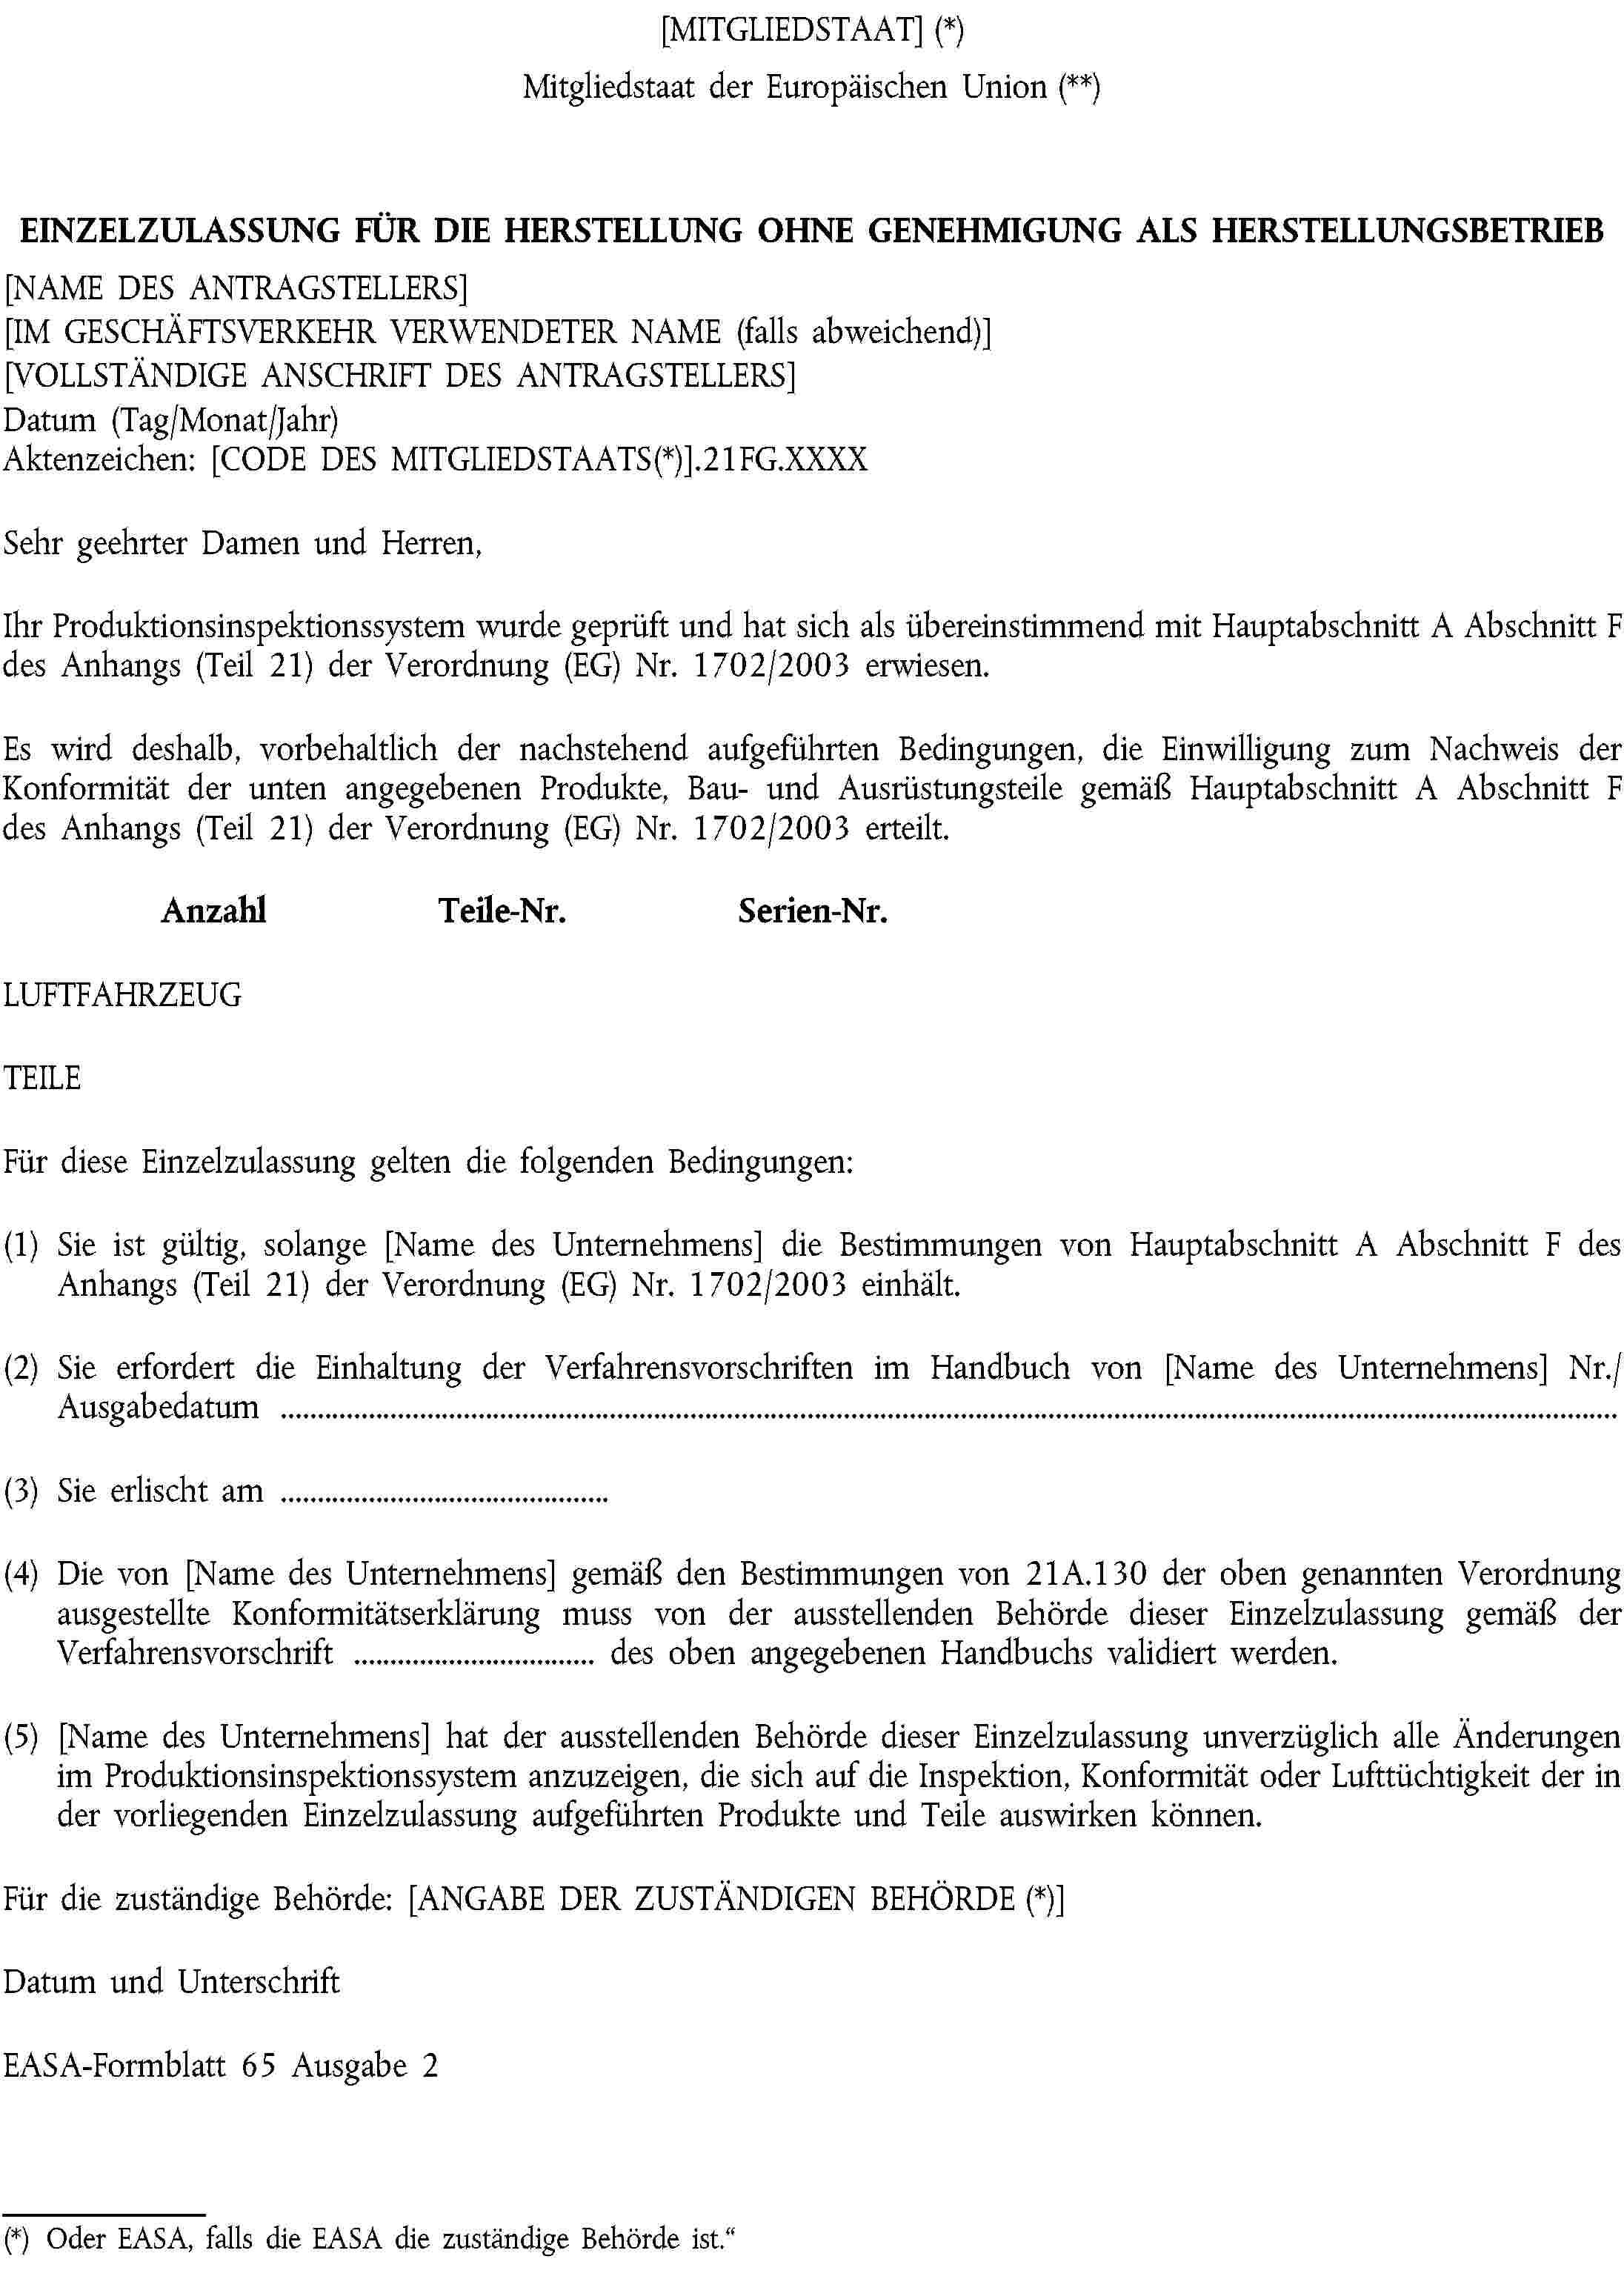 EUR-Lex - 02009R1194-20091228 - EN - EUR-Lex